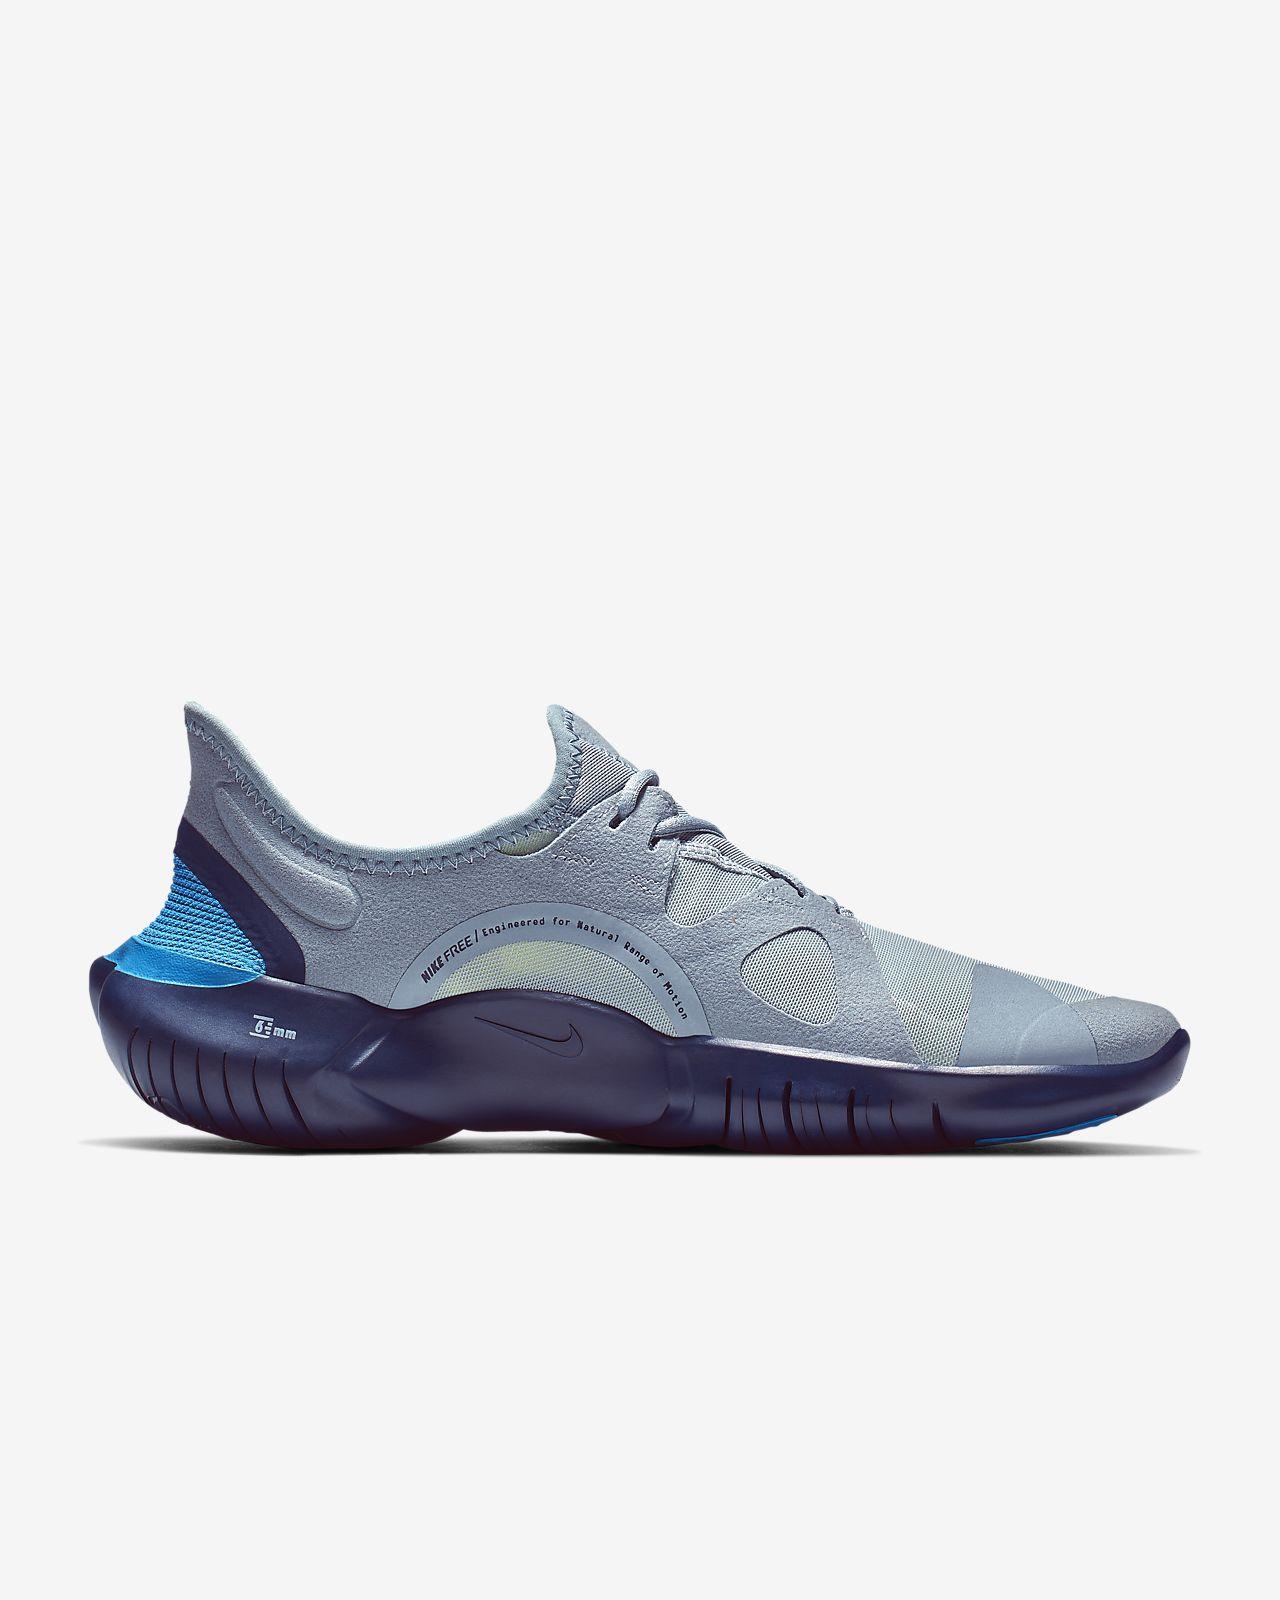 6b9ae8d4727 Nike Free RN 5.0 Men s Running Shoe. Nike.com